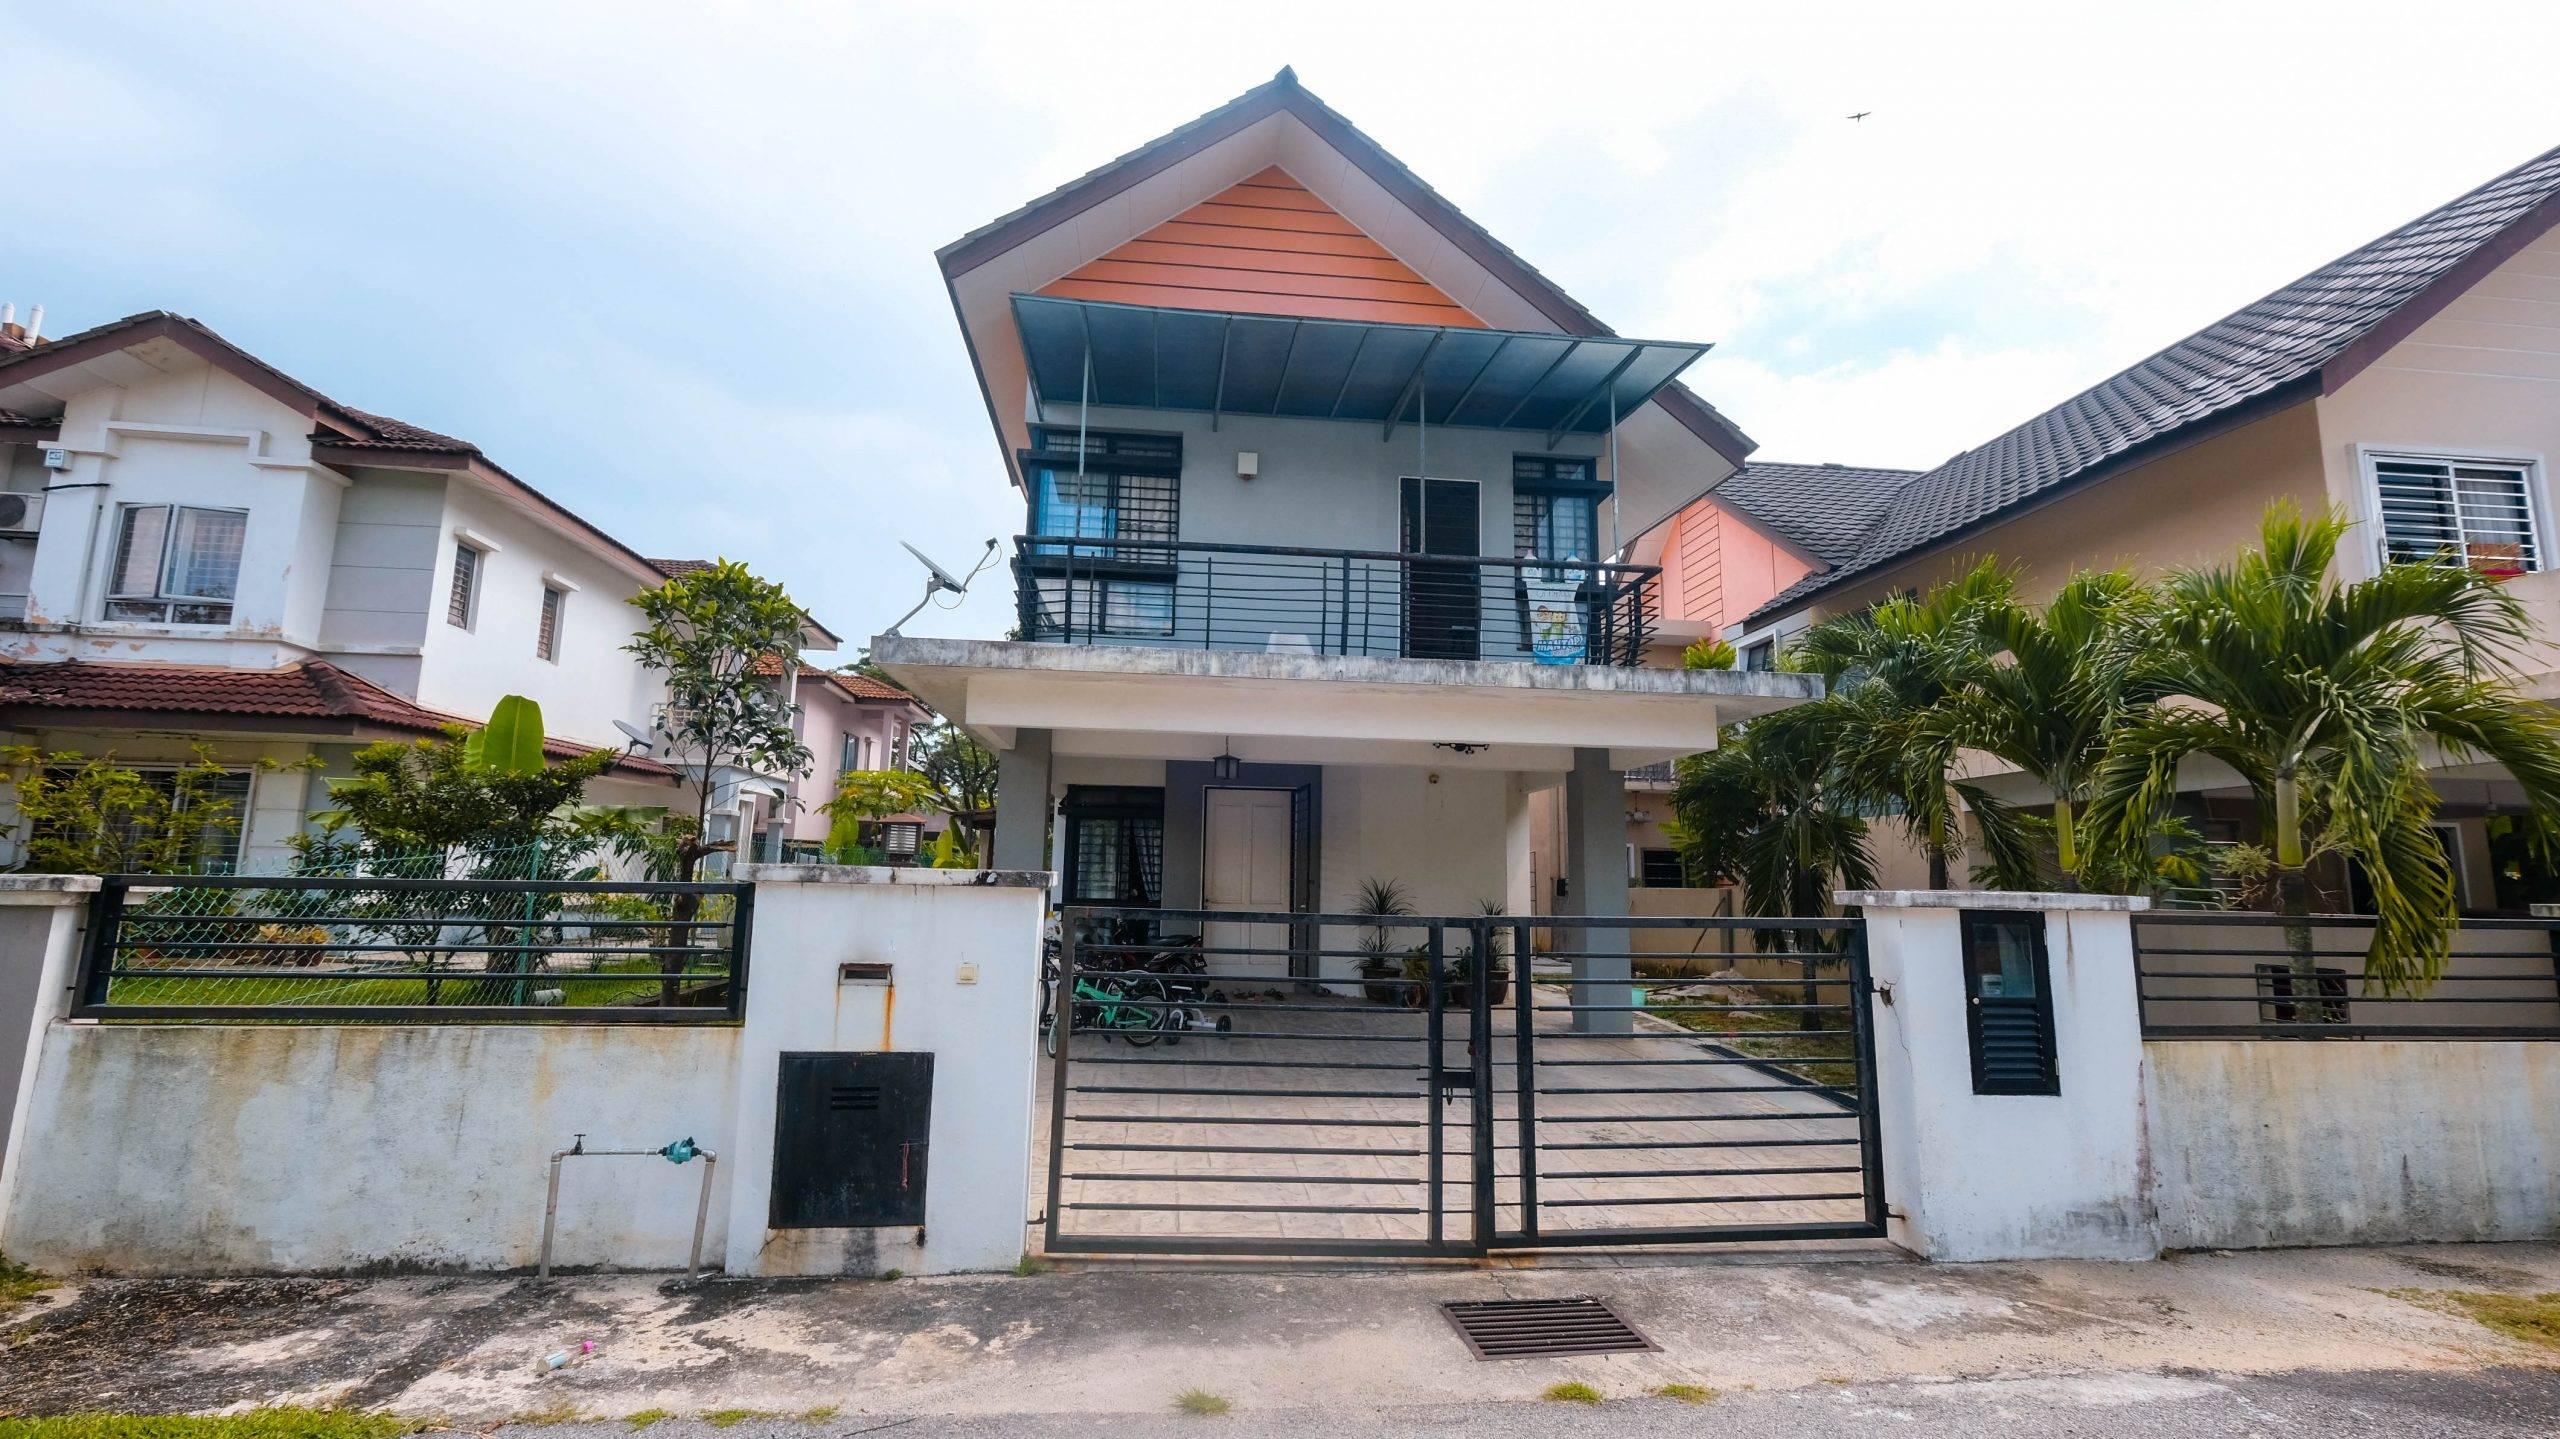 2 Storey Semi Detached ,Semidara Residence , Saujana Utama 3 (SU3) ,Sungai Buloh